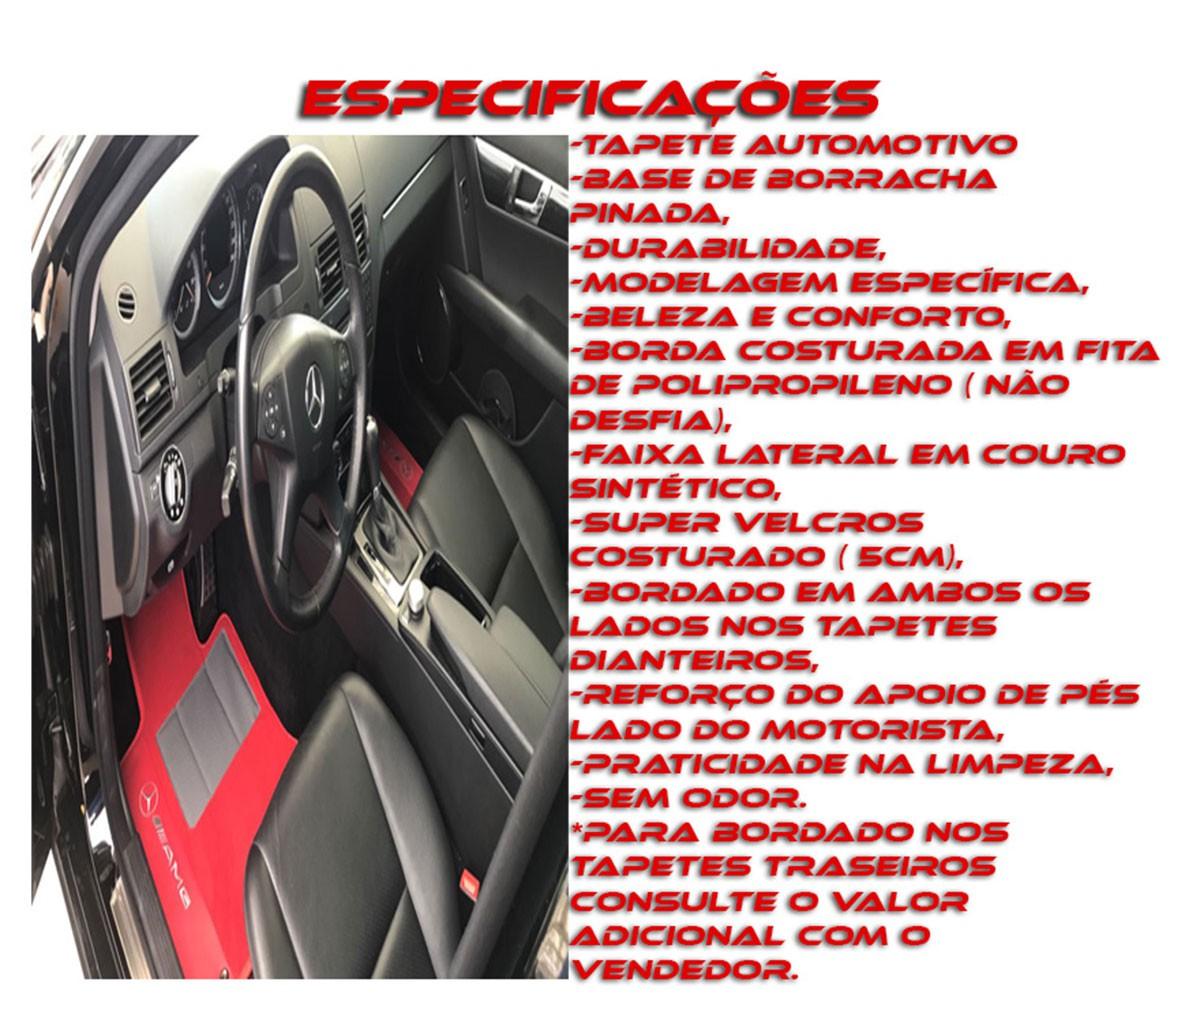 Tapete Fiat Palio Sporting Carpete Luxo Base Borracha Pinada